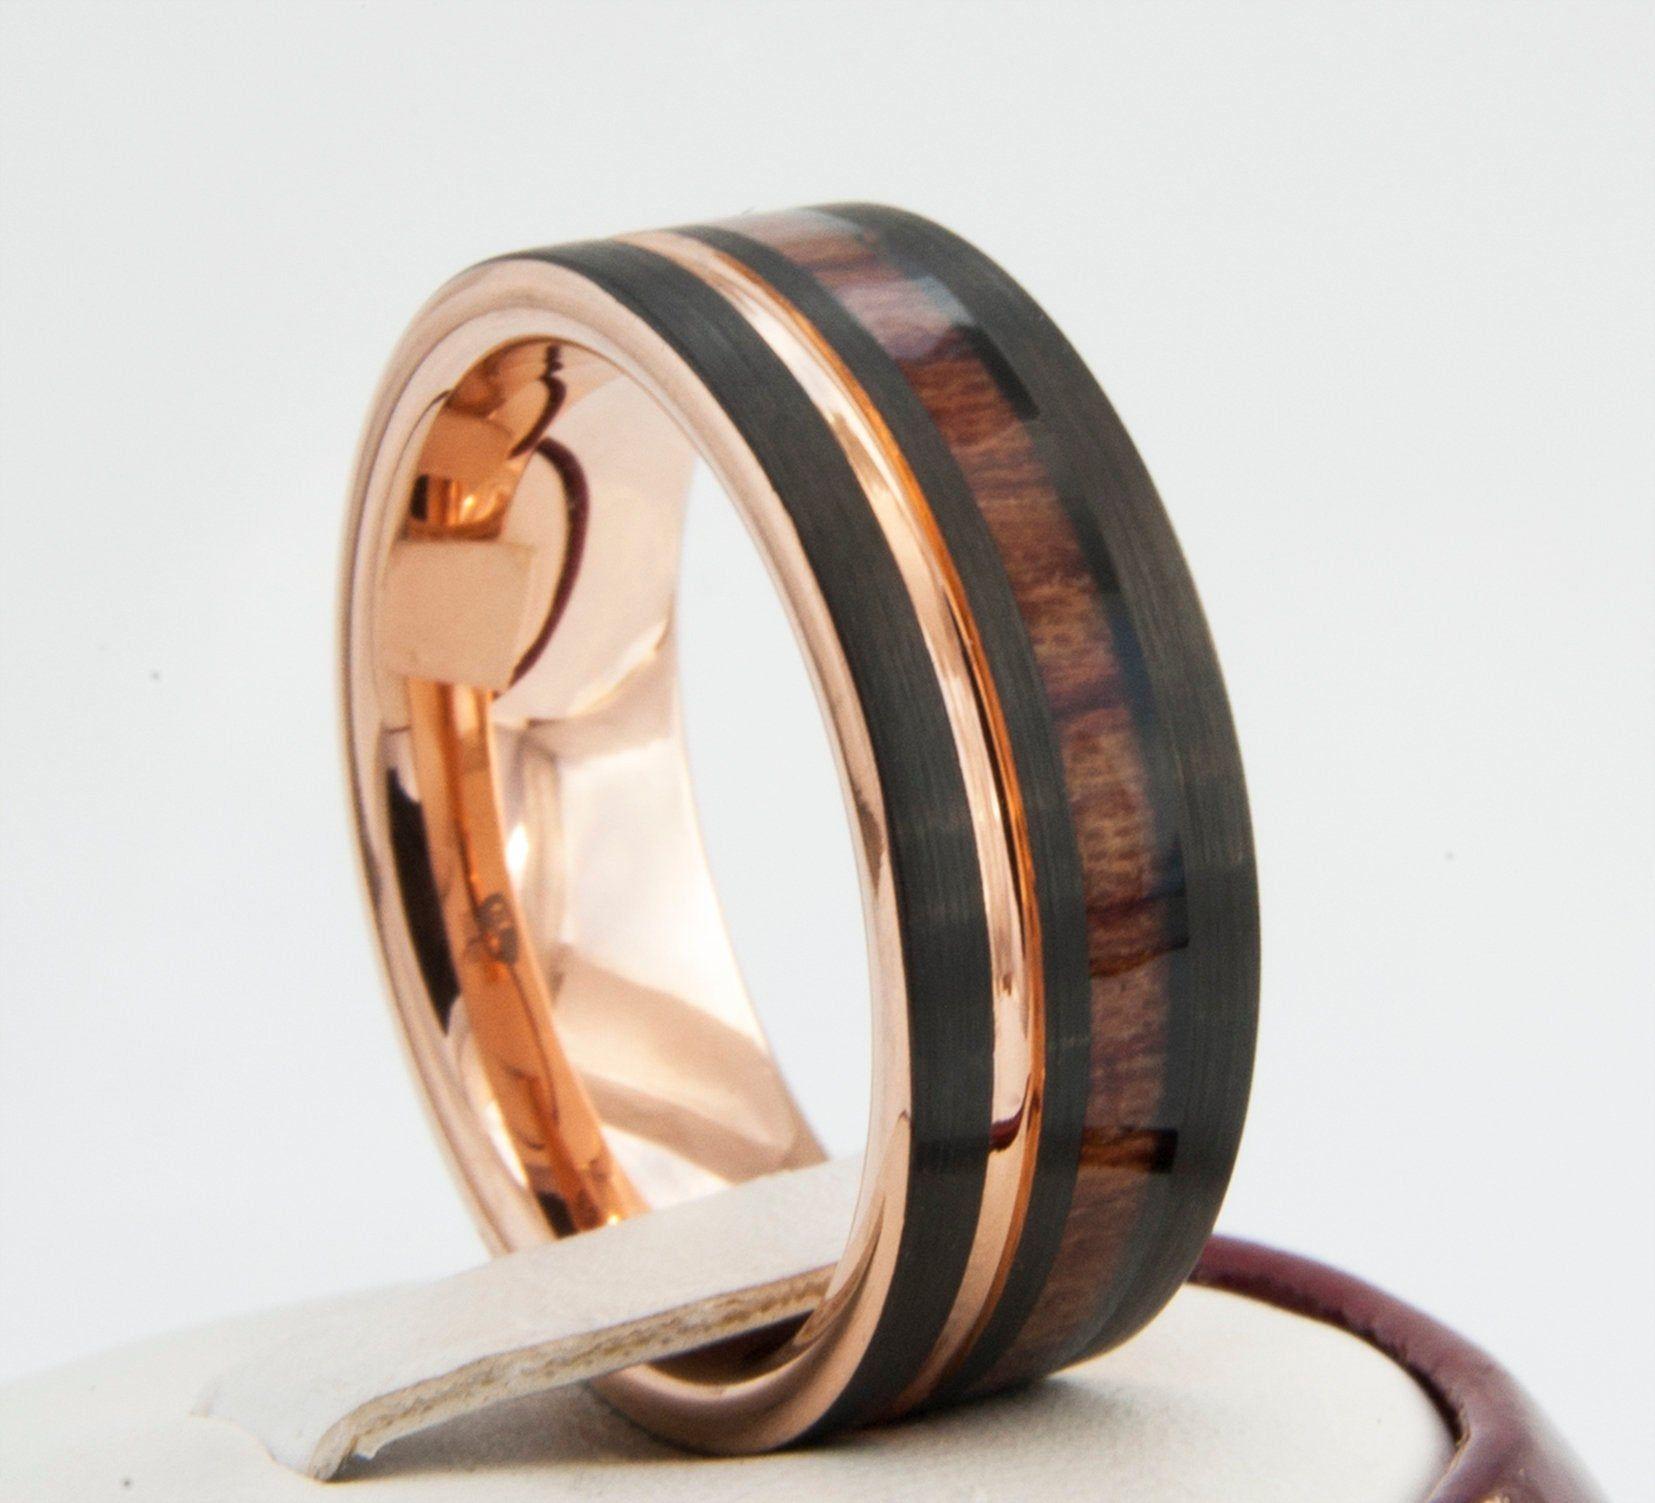 Black Tungsten Ring Rose Gold Wedding Band Wood Inlay Groove Etsy Gold Tungsten Ring Black Tungsten Rings Rose Gold Tungsten